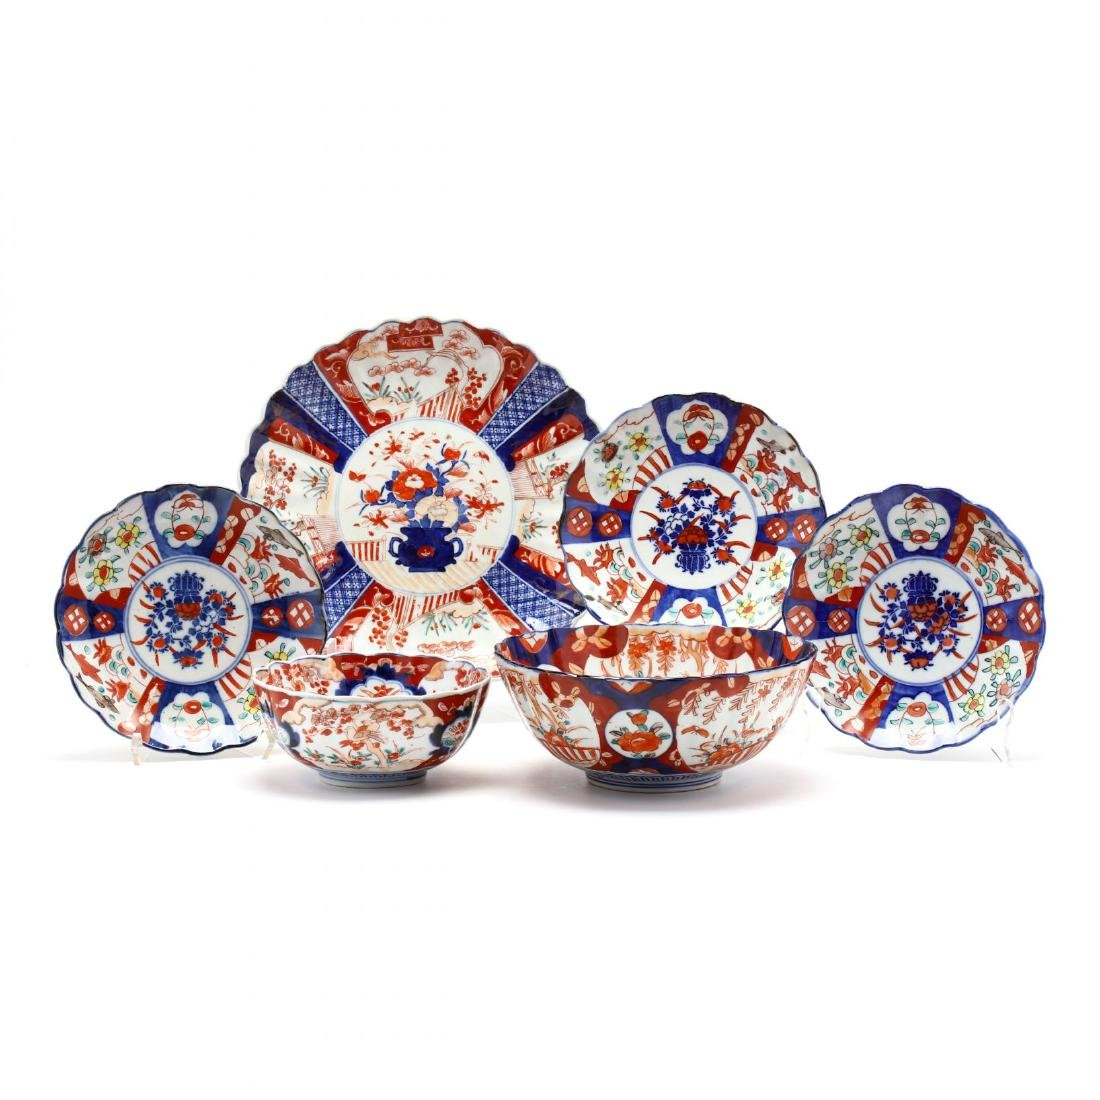 A Group of Imari Porcelain